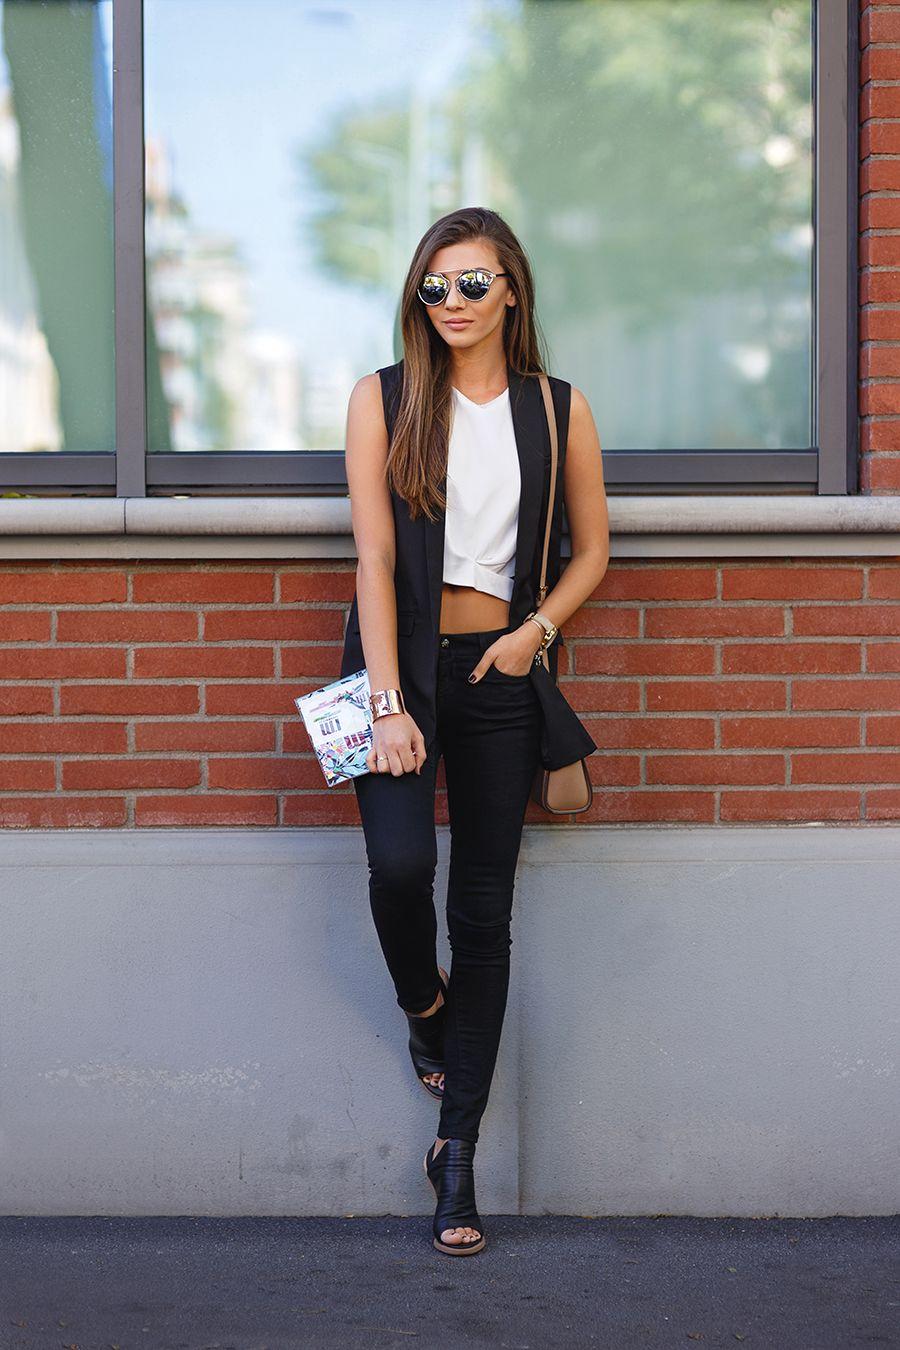 What to wear with a black sleeveless blazer